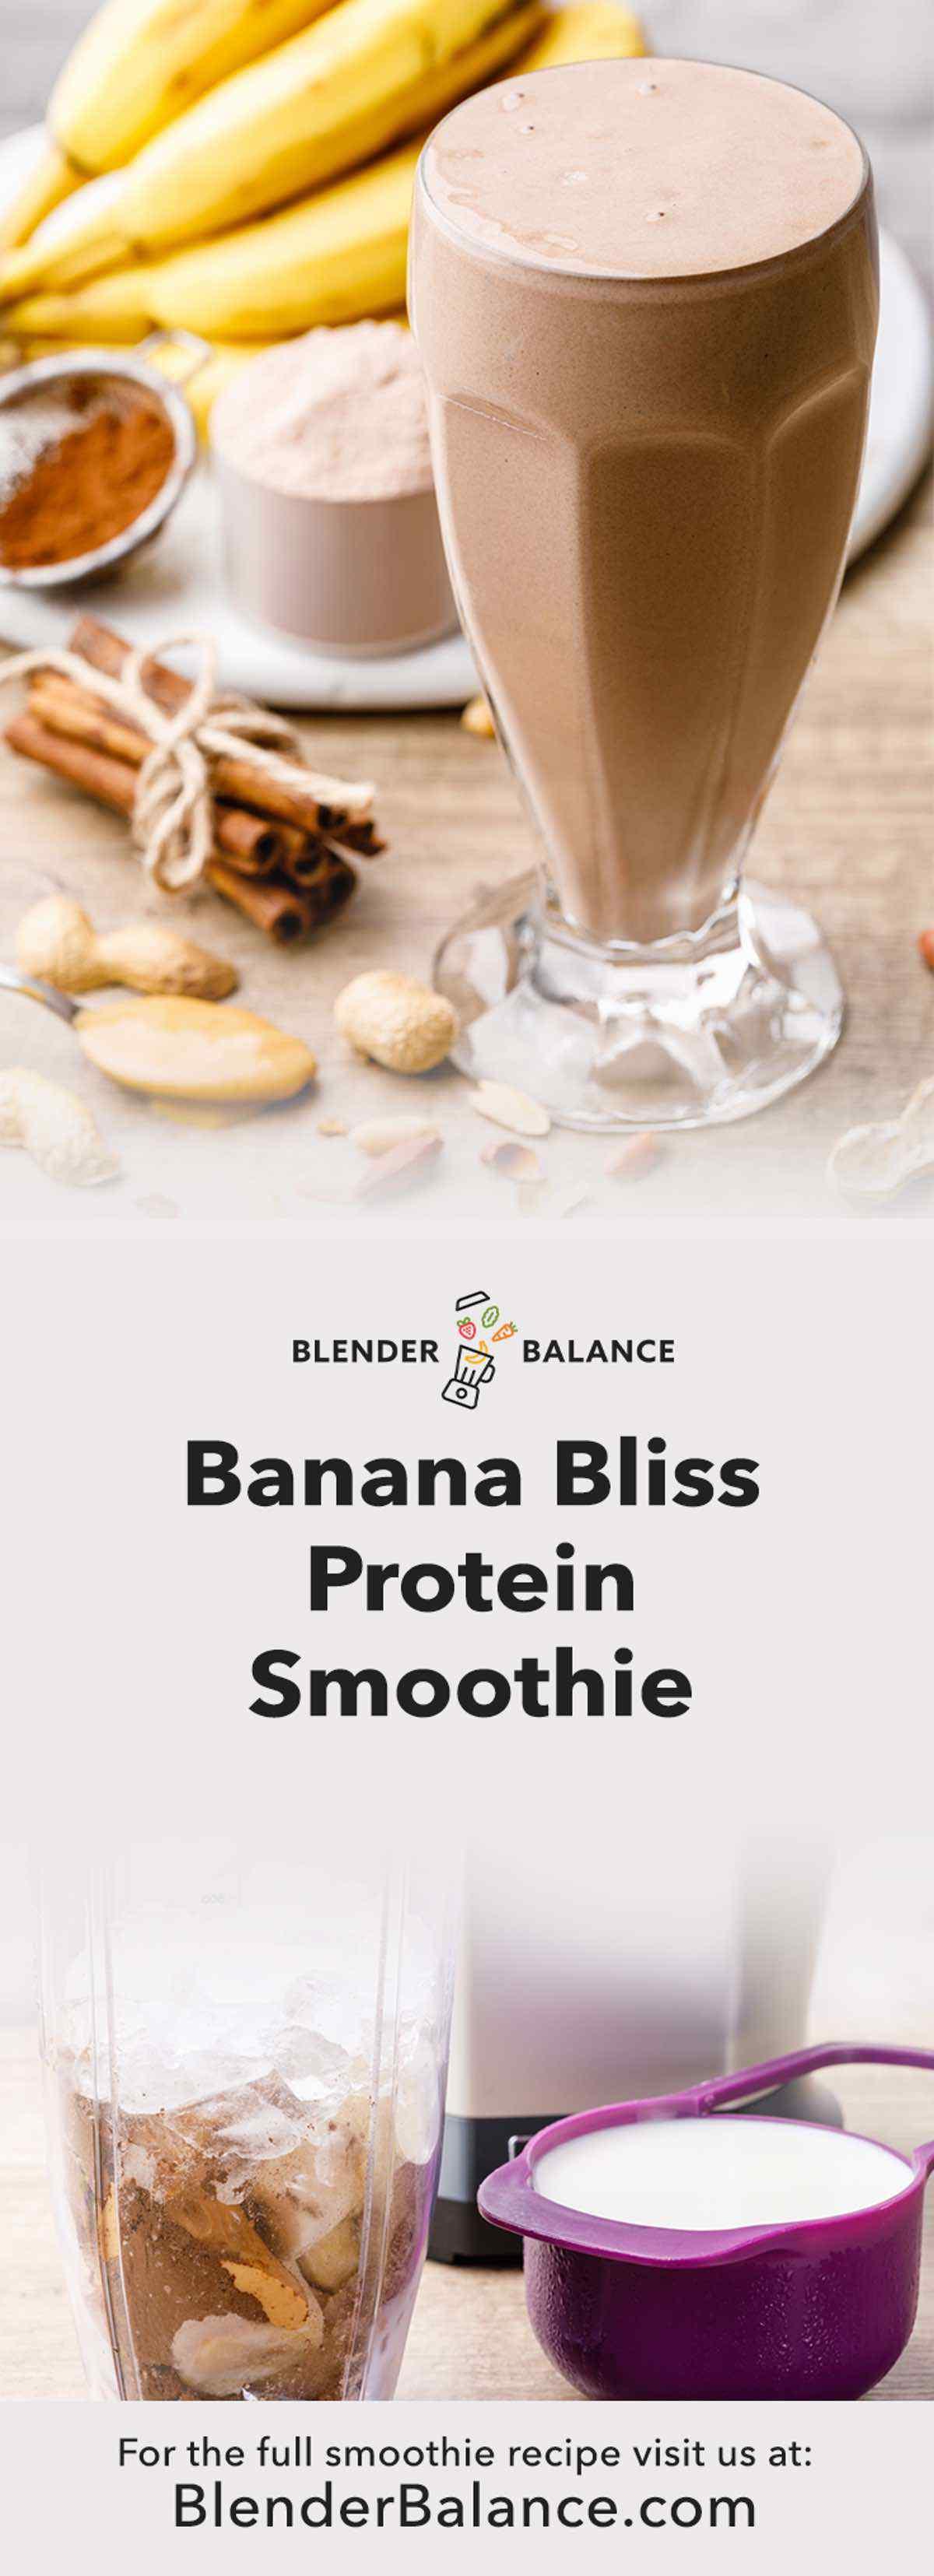 Banana Bliss Protein Smoothie - Protein-Packed Chocolate Shake Recipe - Blender Balance #healthychocolateshakes